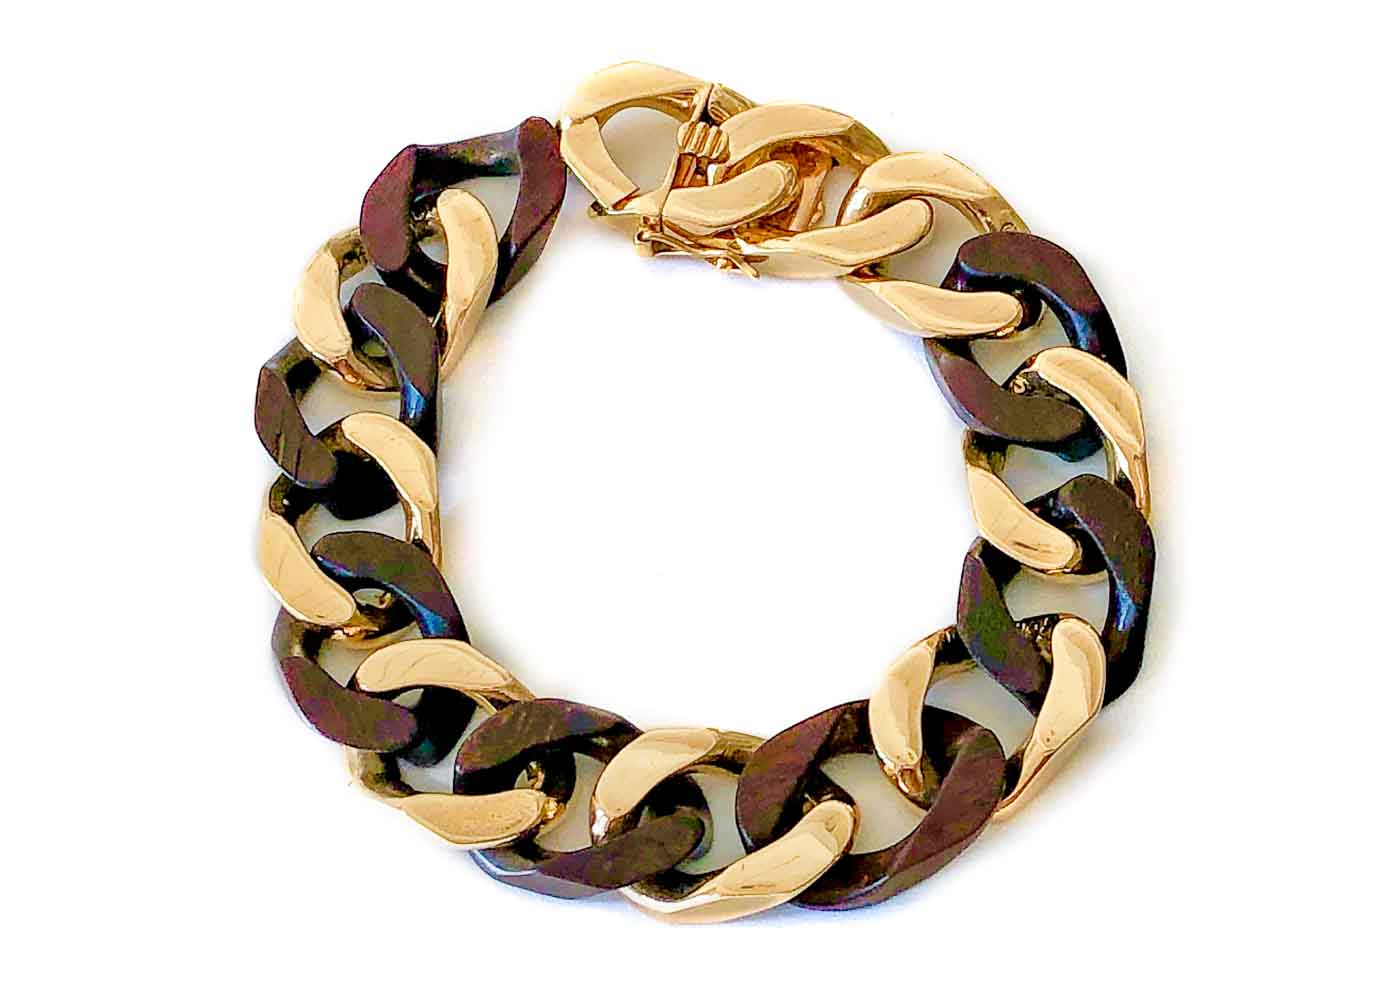 van cleef cocobola wood and gold curb link bracelet